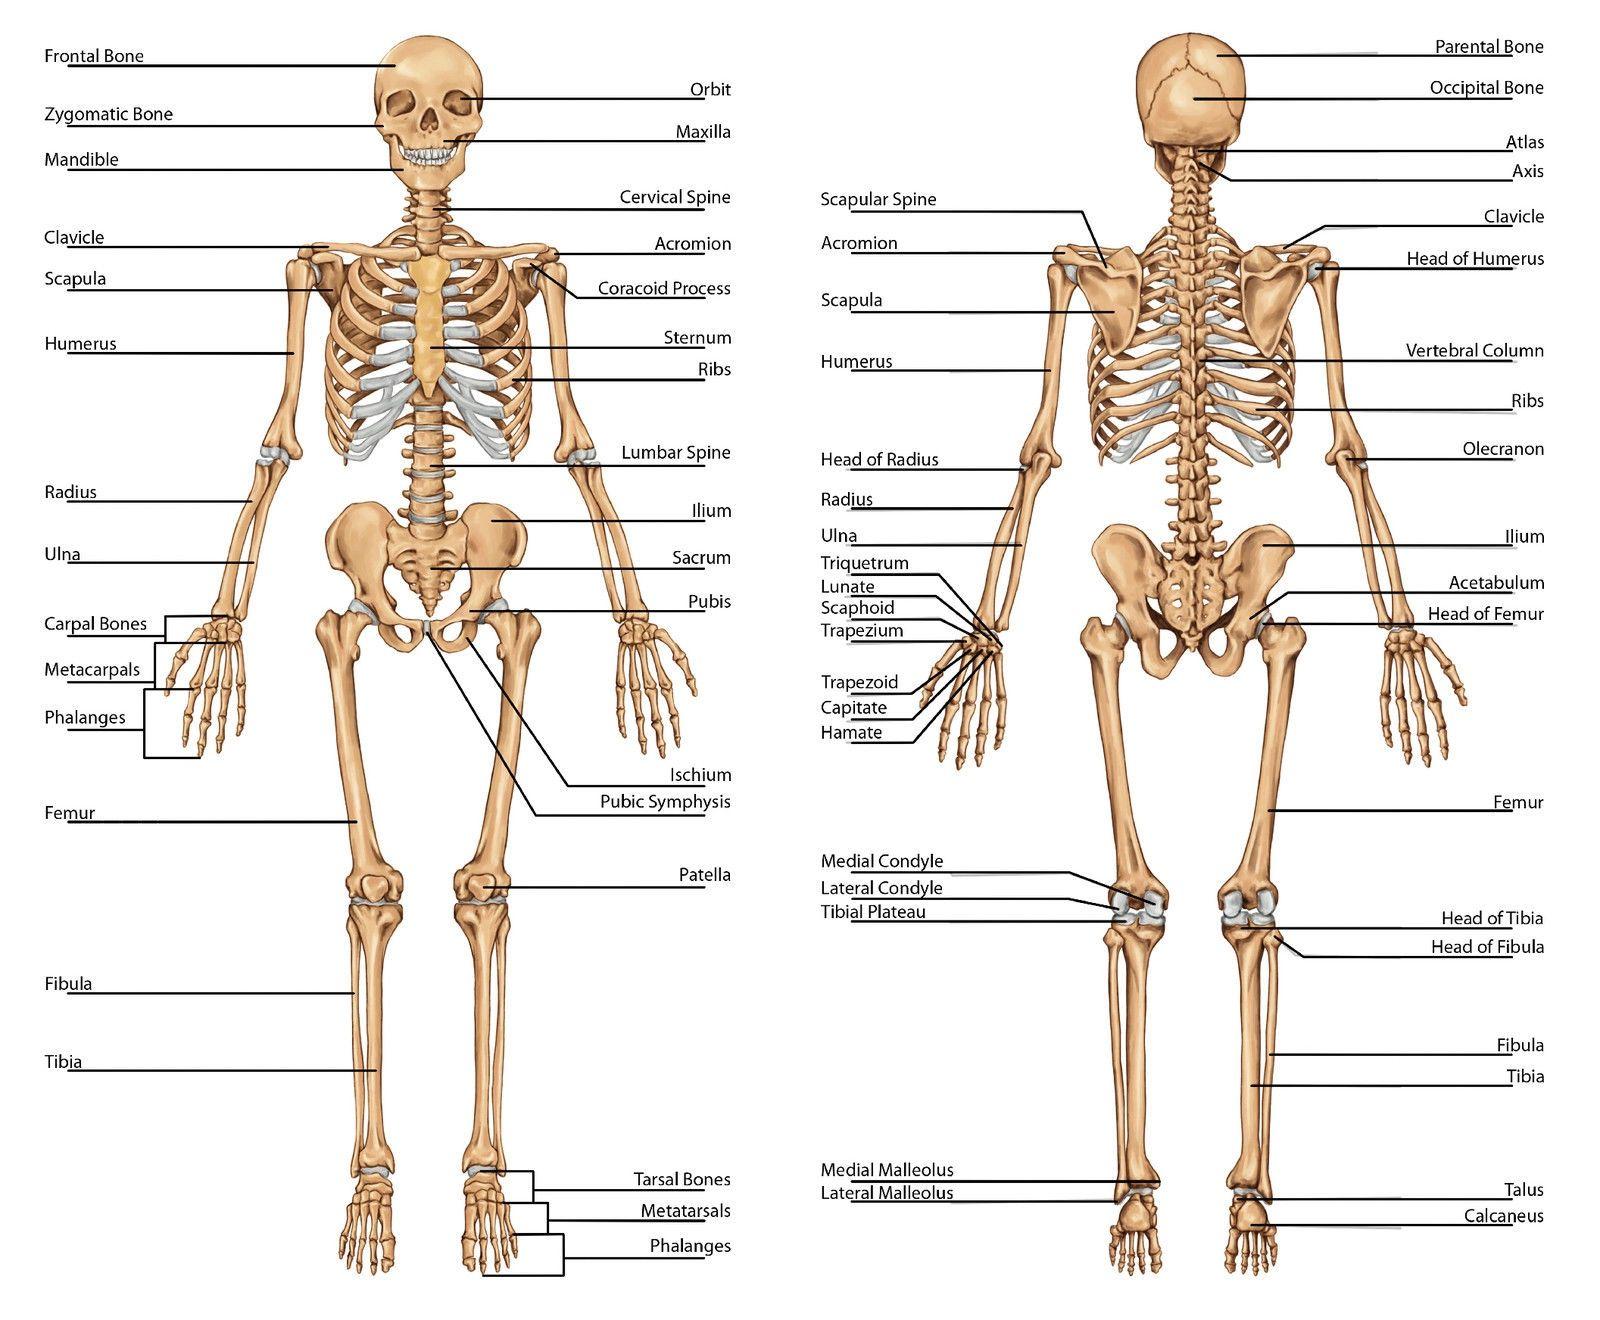 medium resolution of anatomy of the bones in your body skeleton bones human skeleton anatomy bones diagram human anatomy